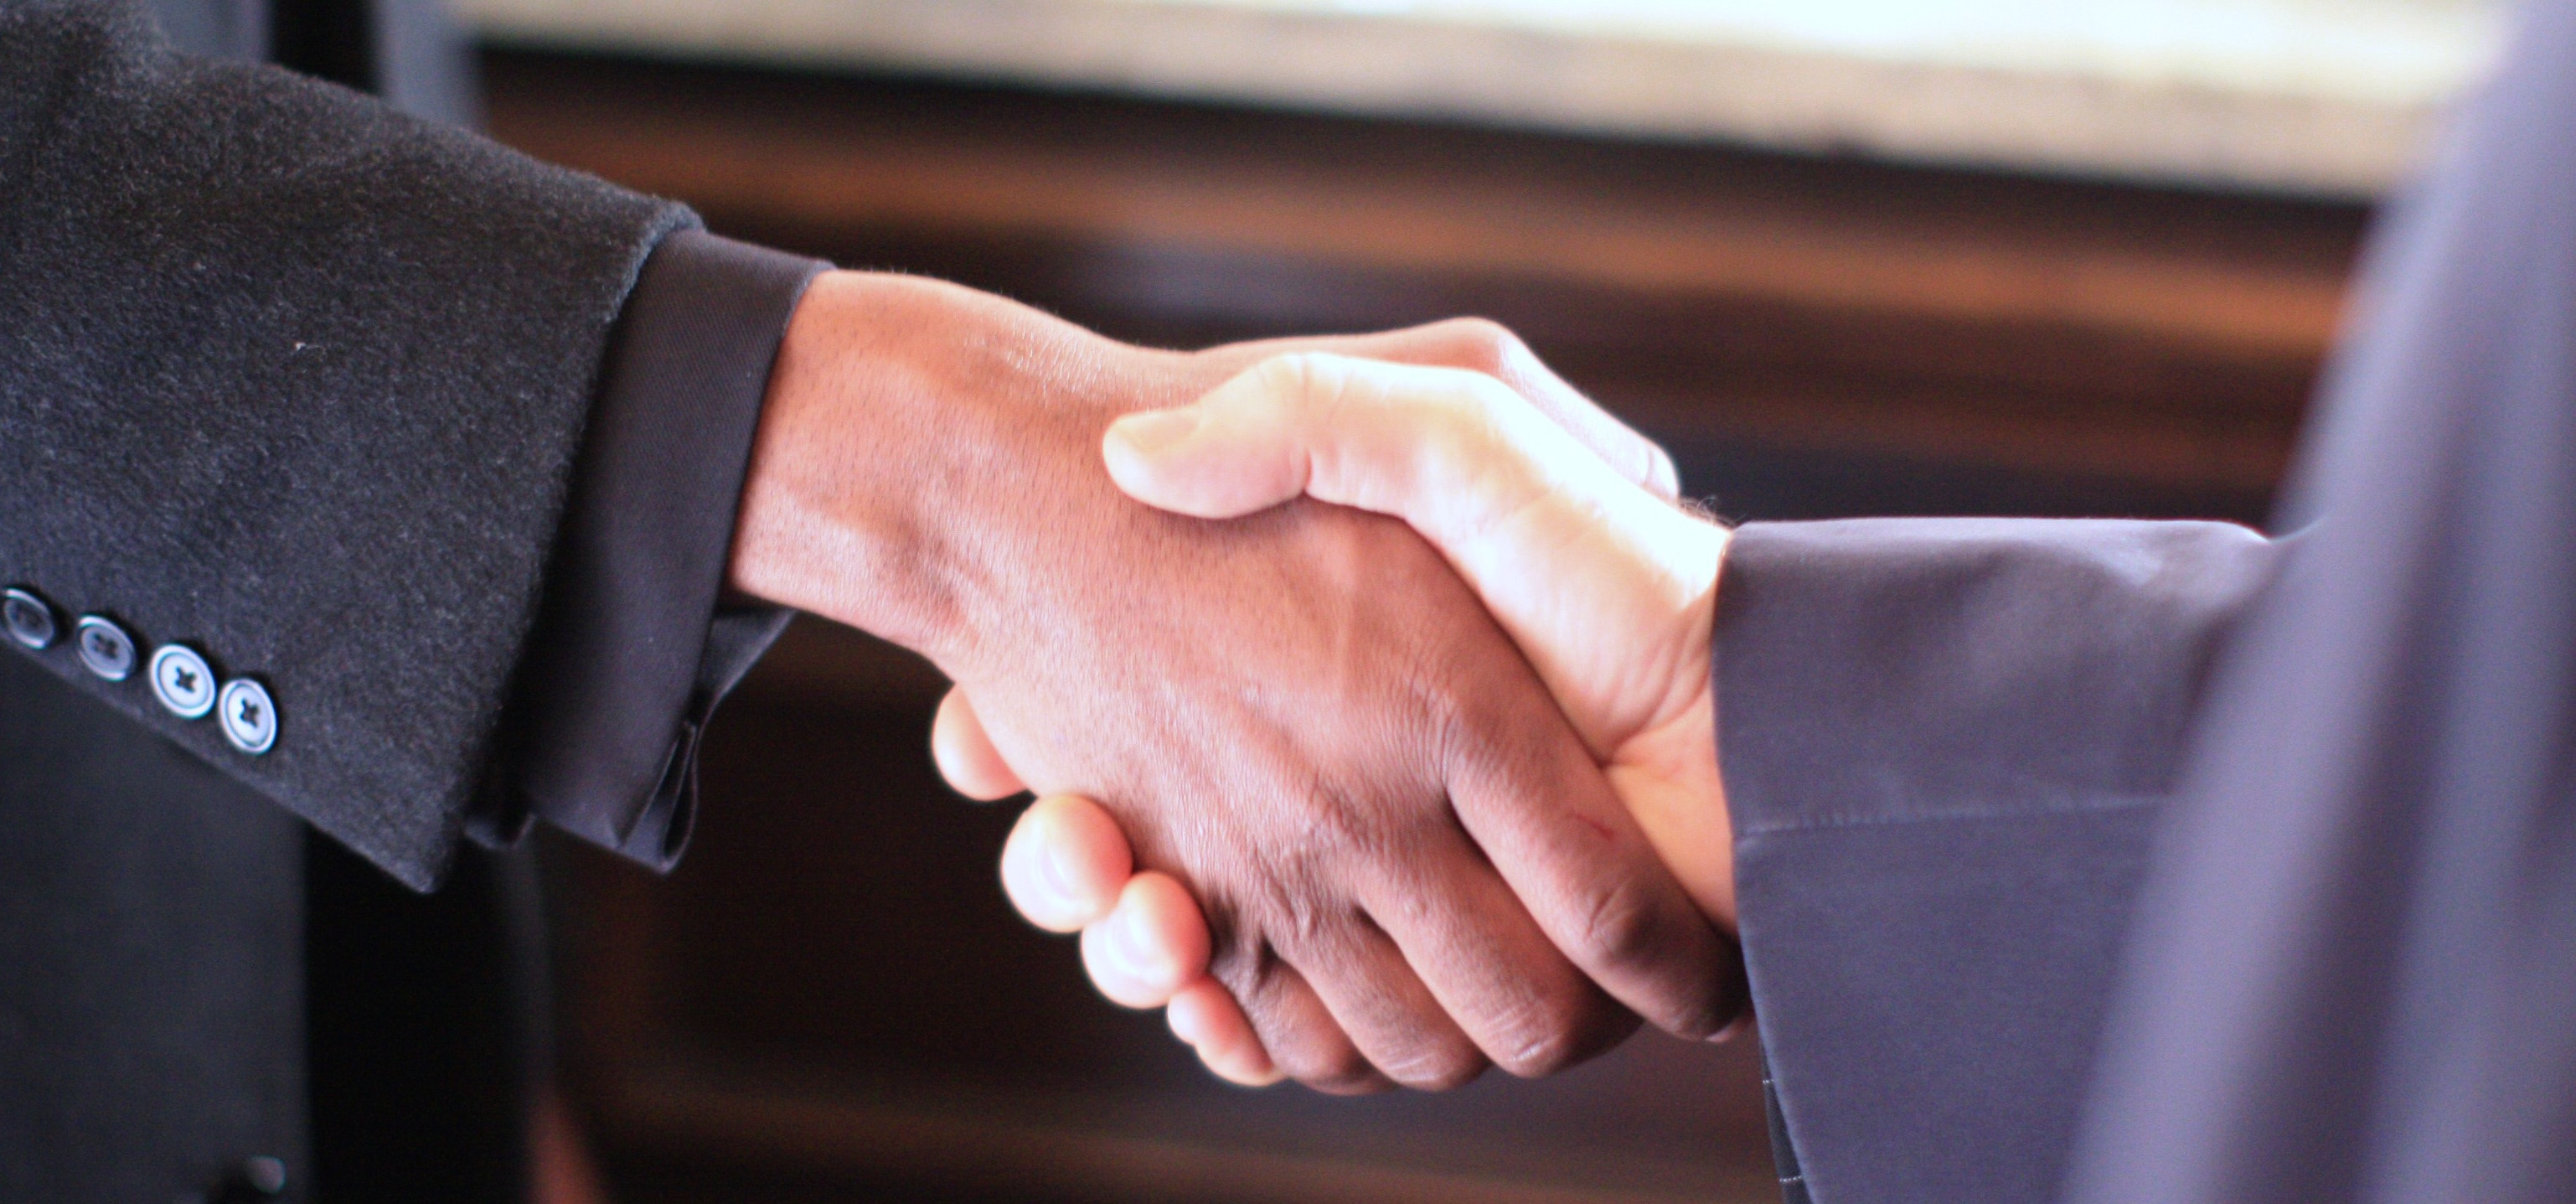 inbound marketing services networking opportunities